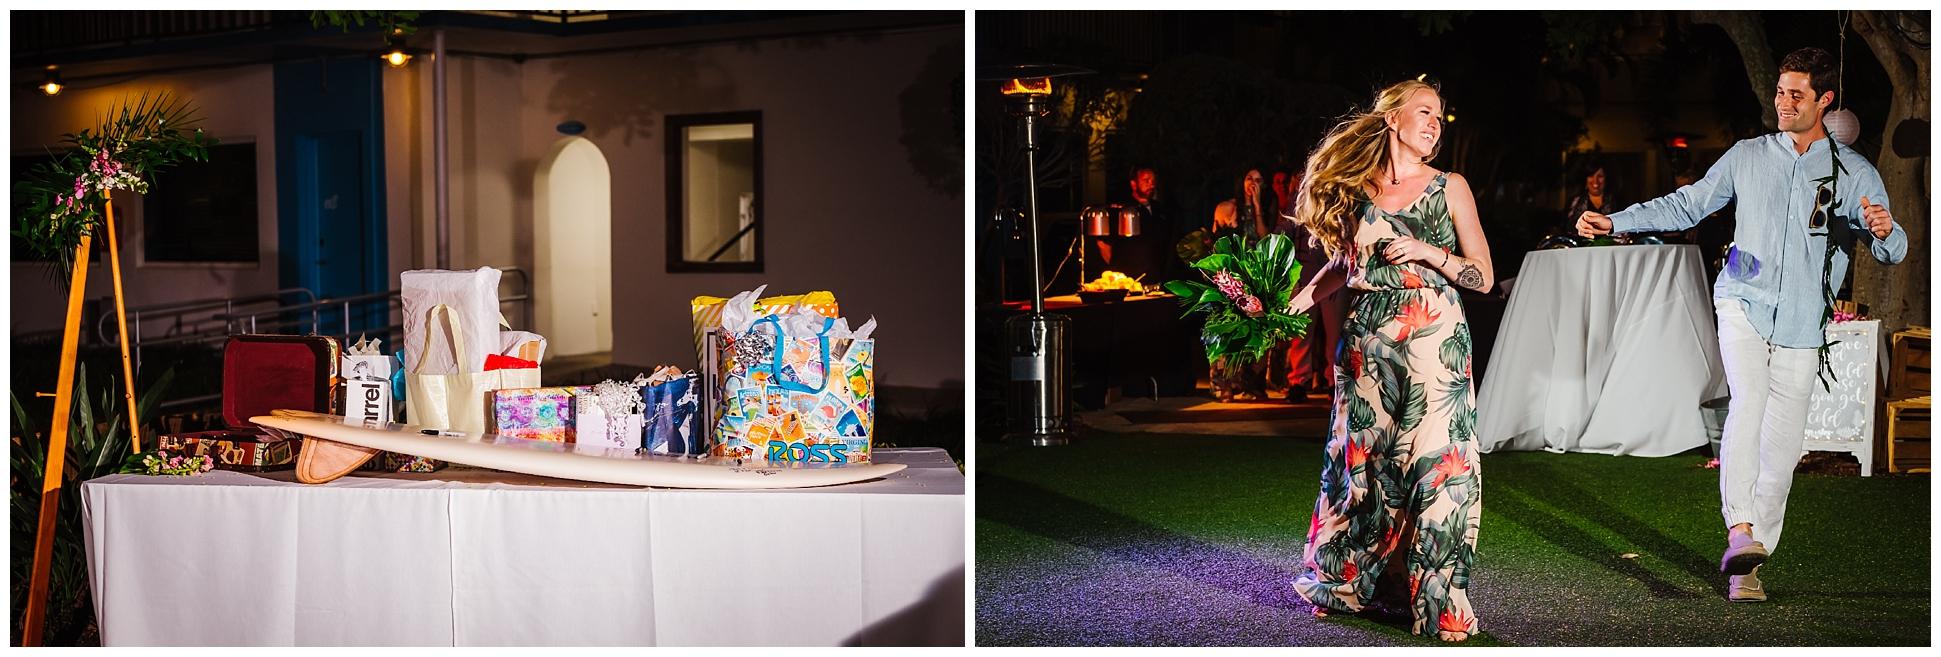 tampa-bay-wedding-photographer-barefoot-post-card-inn-tropical-hawaiin-lei-pink-pineapples-flower-crown_0194.jpg